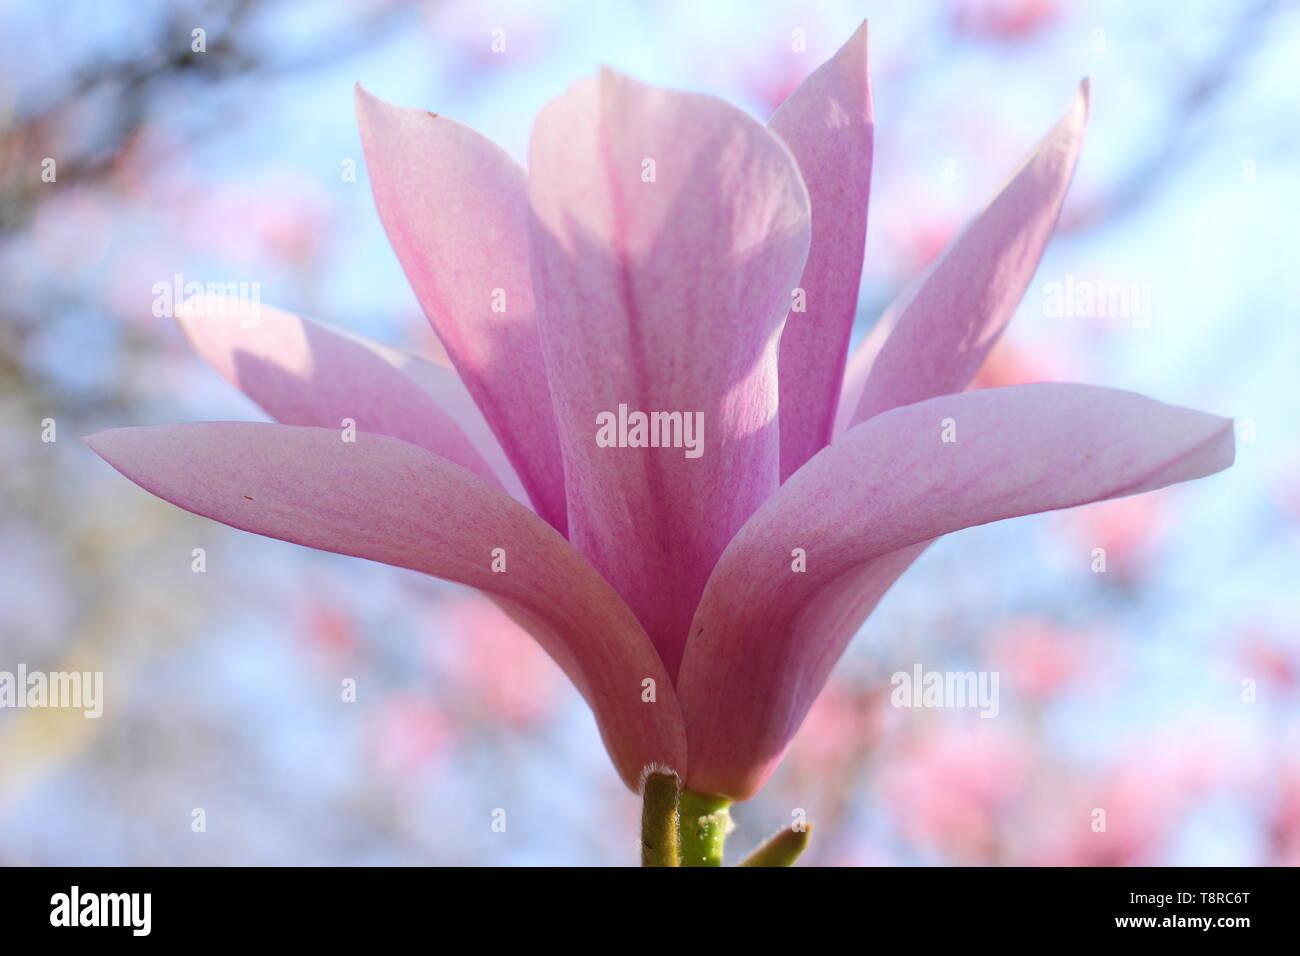 Magnolia 'Heaven Scent'. Rosy pink blossoms of Magnolia 'Heaven Sent' in April - UK. AGM - Stock Image